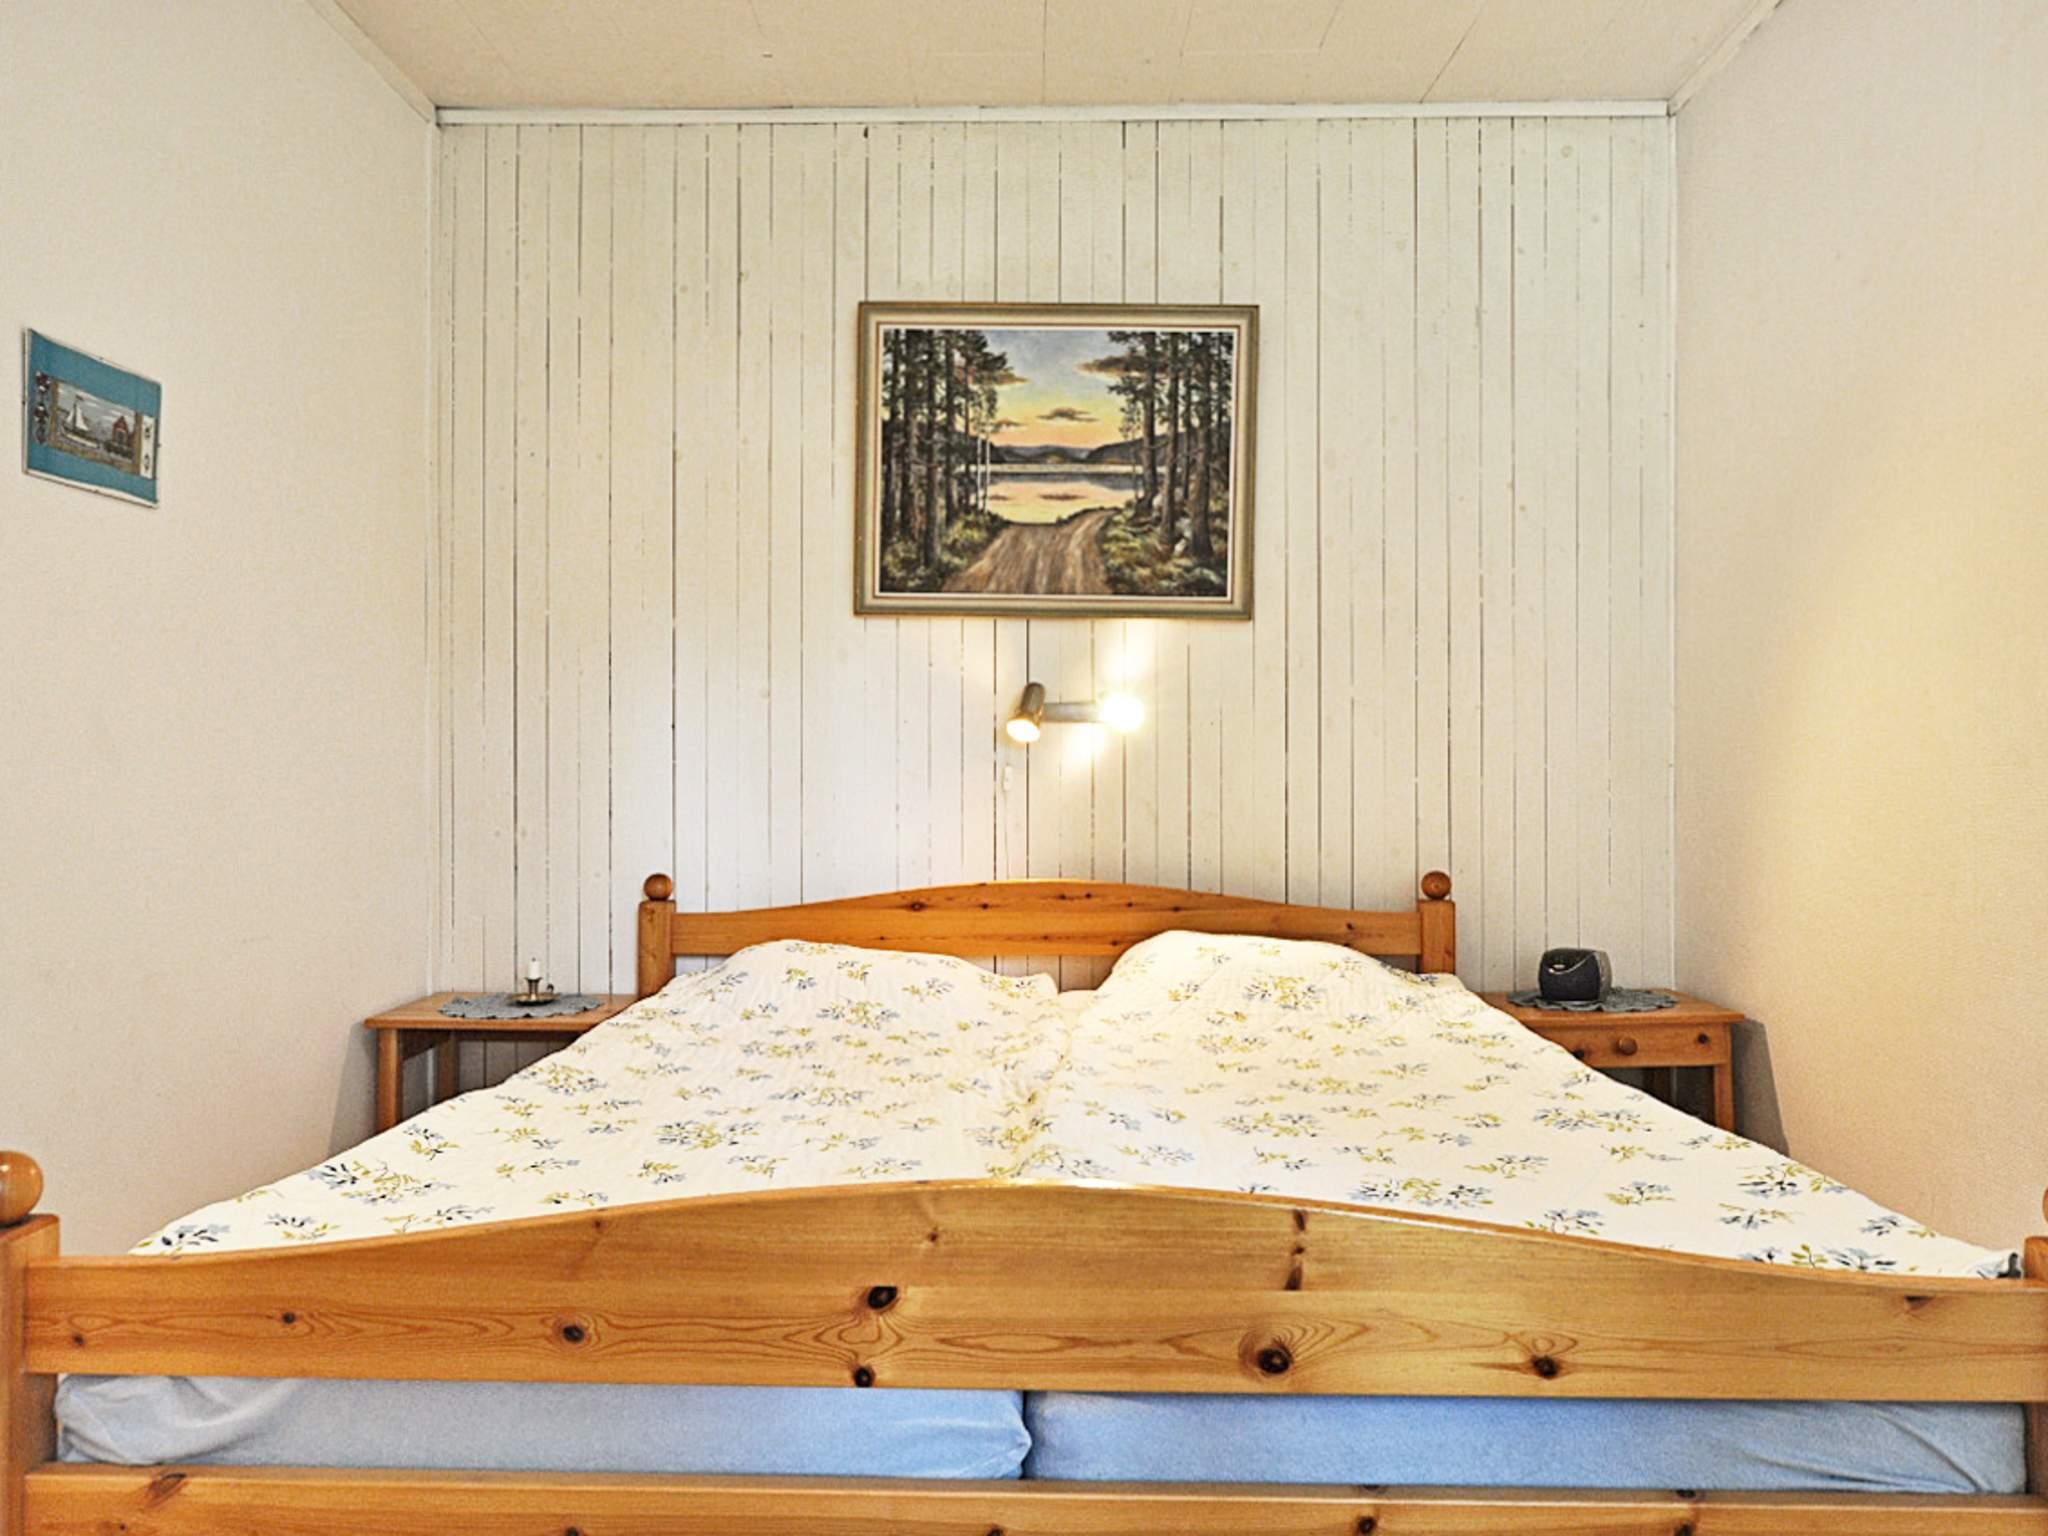 Ferienhaus Finjasjön (86936), Hässleholm, Skane län, Südschweden, Schweden, Bild 6